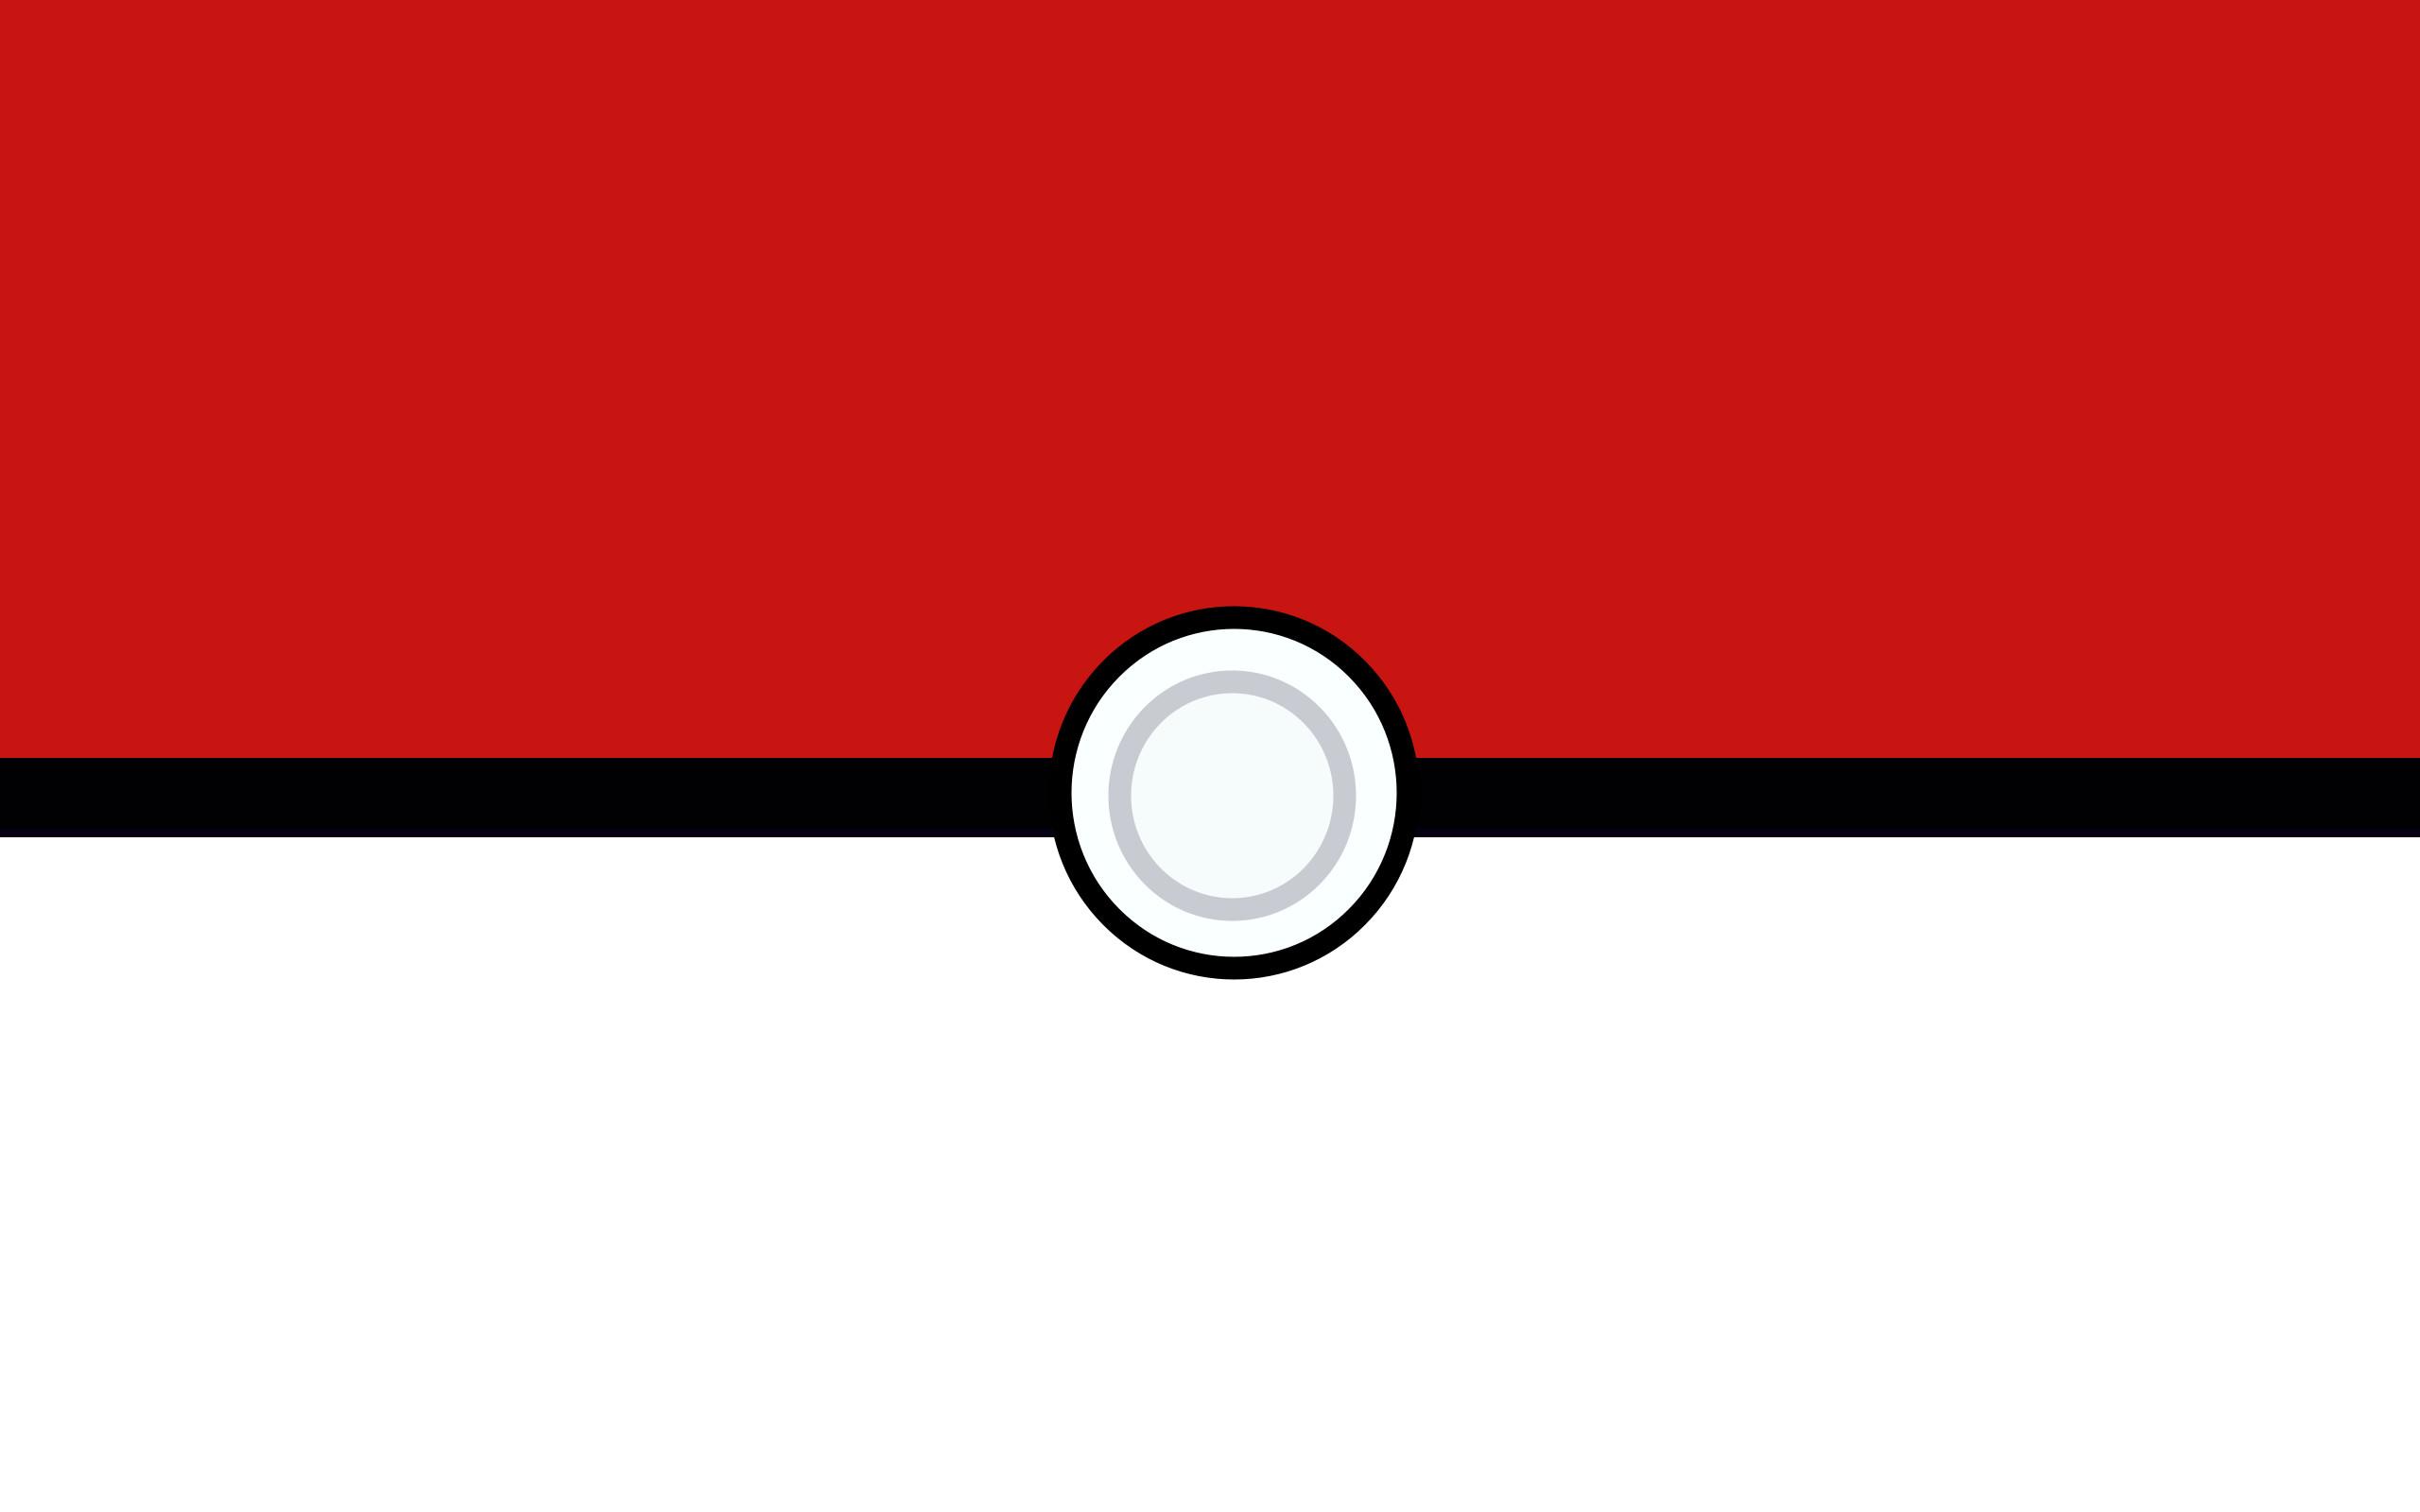 Video Game РPok̩mon Pokeball Wallpaper